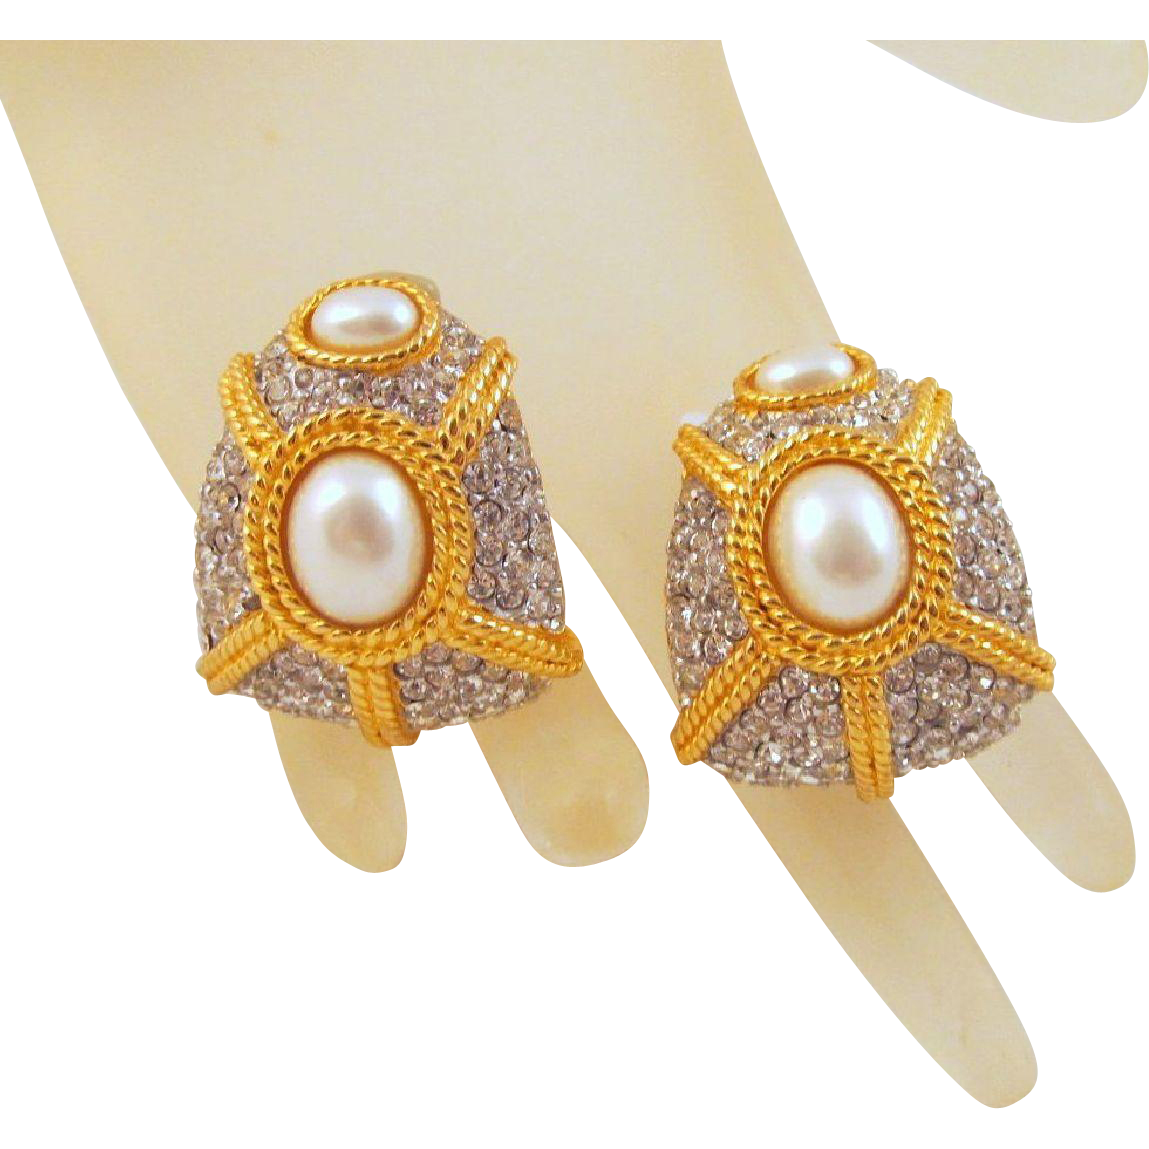 Ciner Faux Pearl Rhinestone Earrings 1980s Bling Runway Gold Plated Vintage Clip